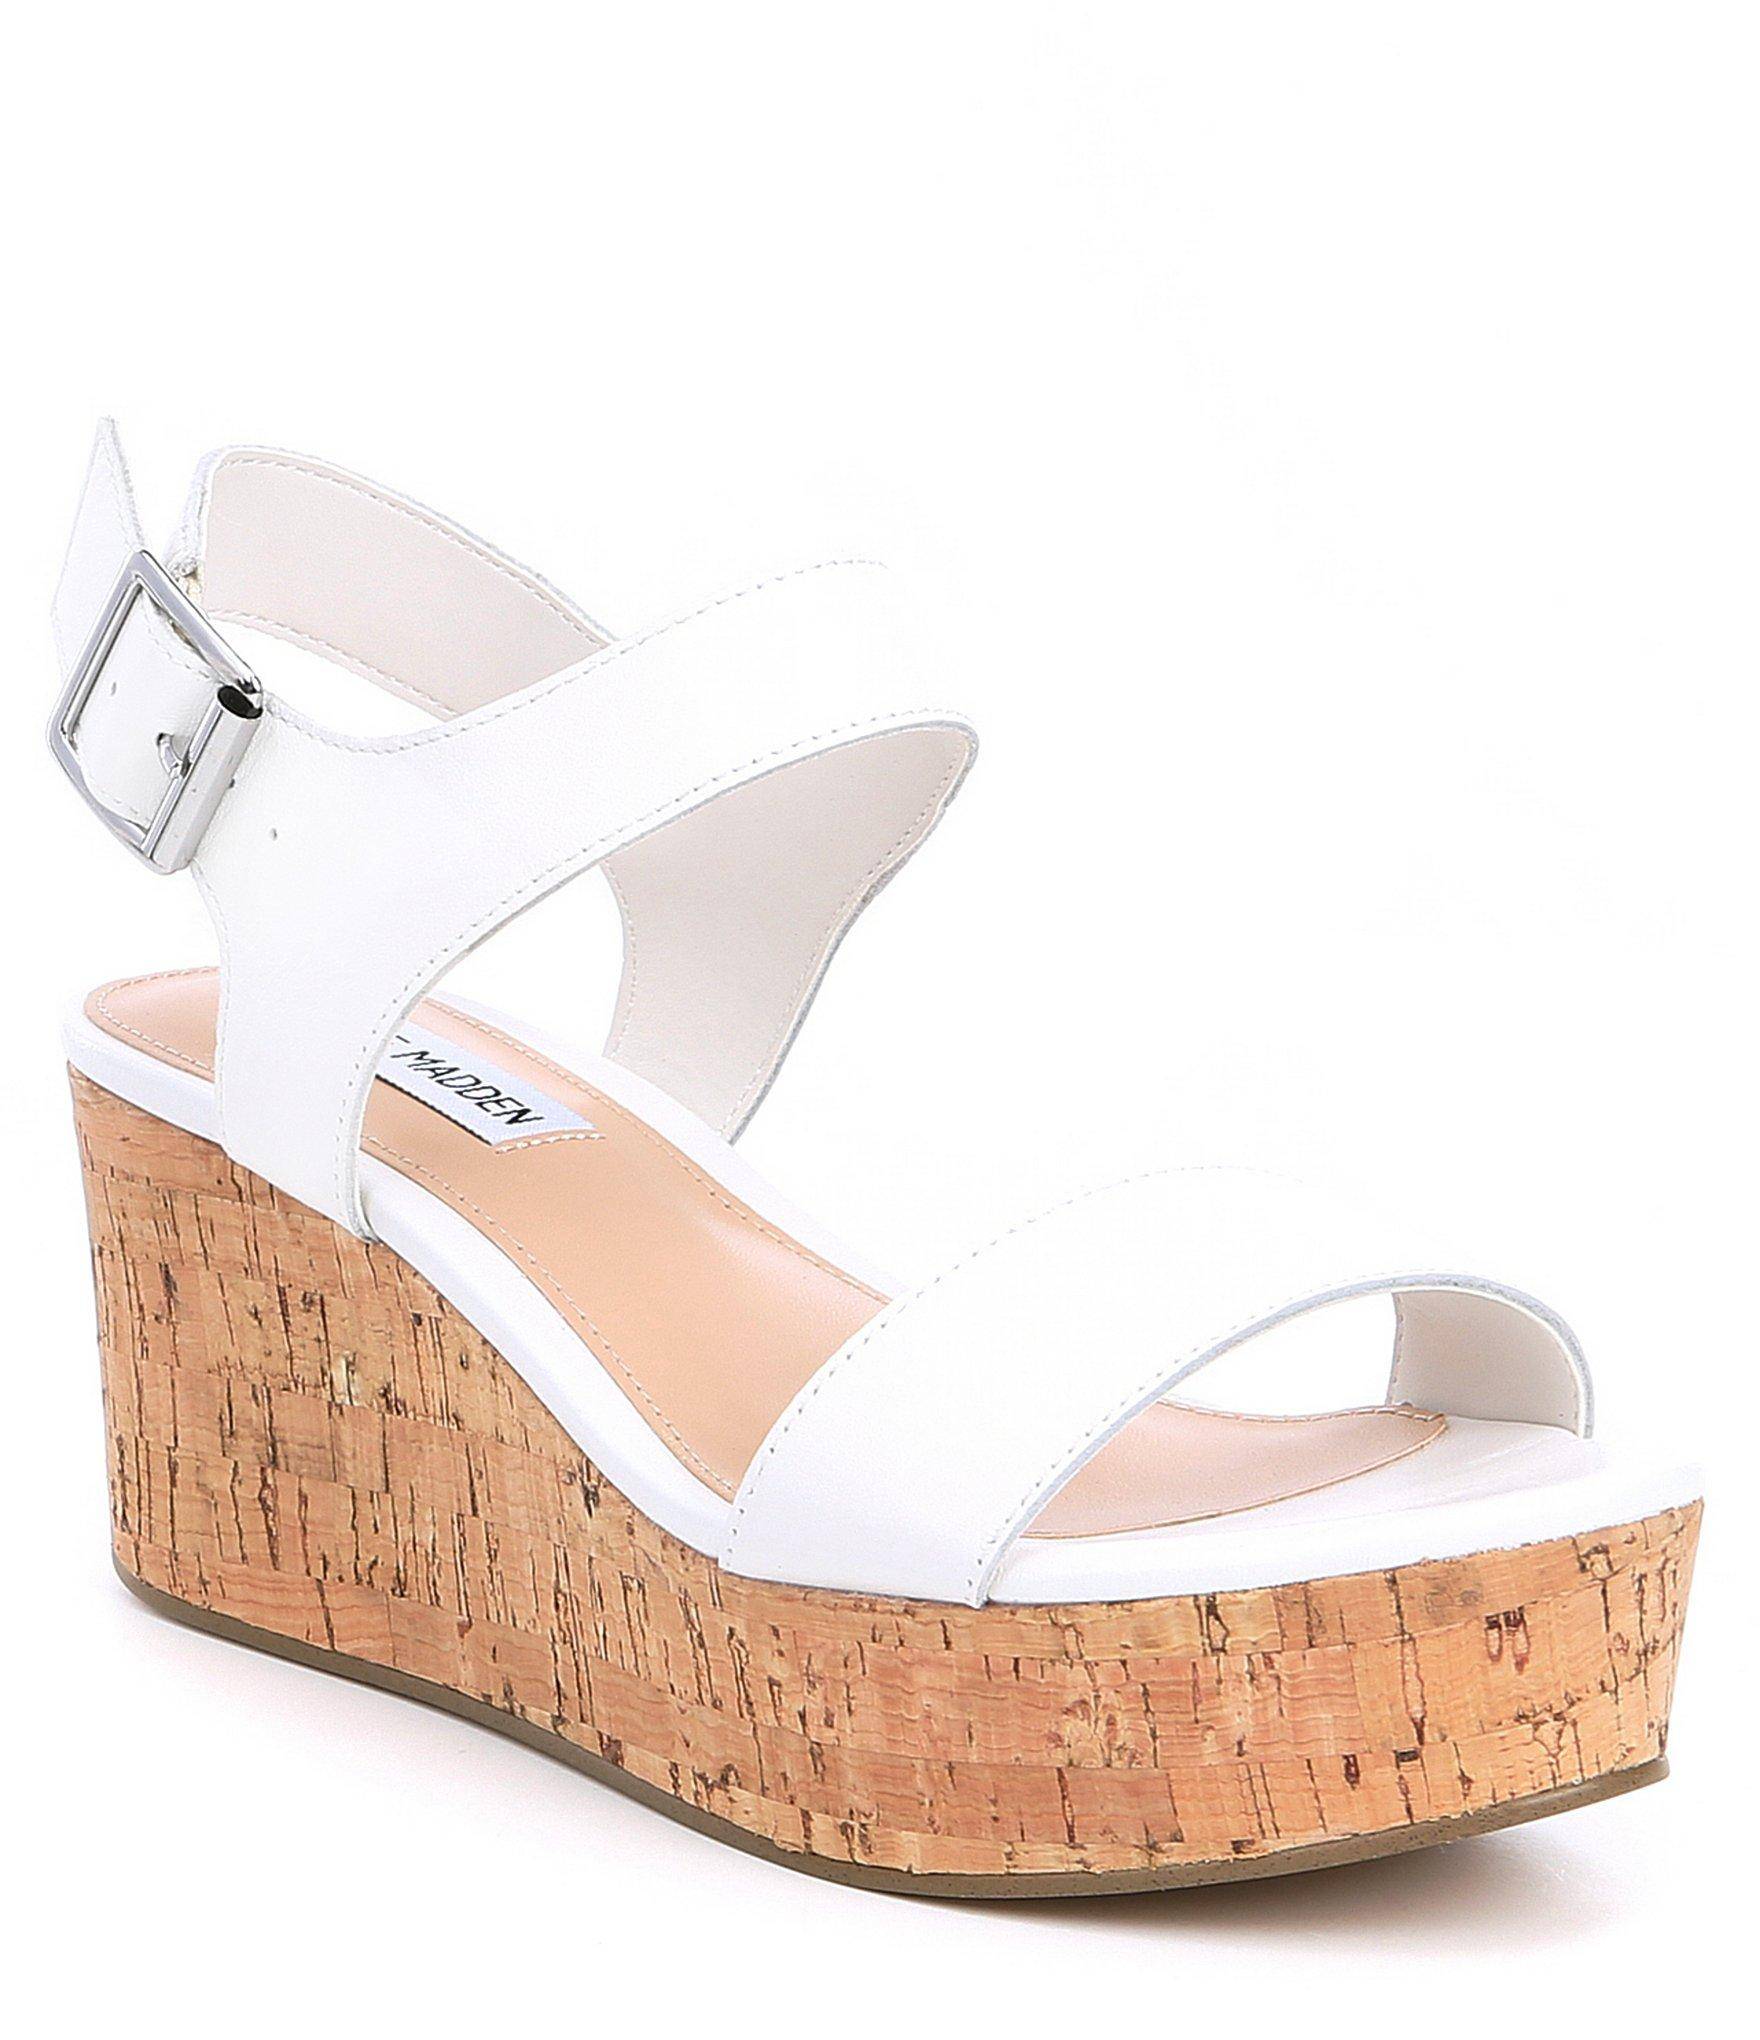 33f66d2379ab Lyst - Steve Madden Breathe Leather   Cork Platform Sandals in White